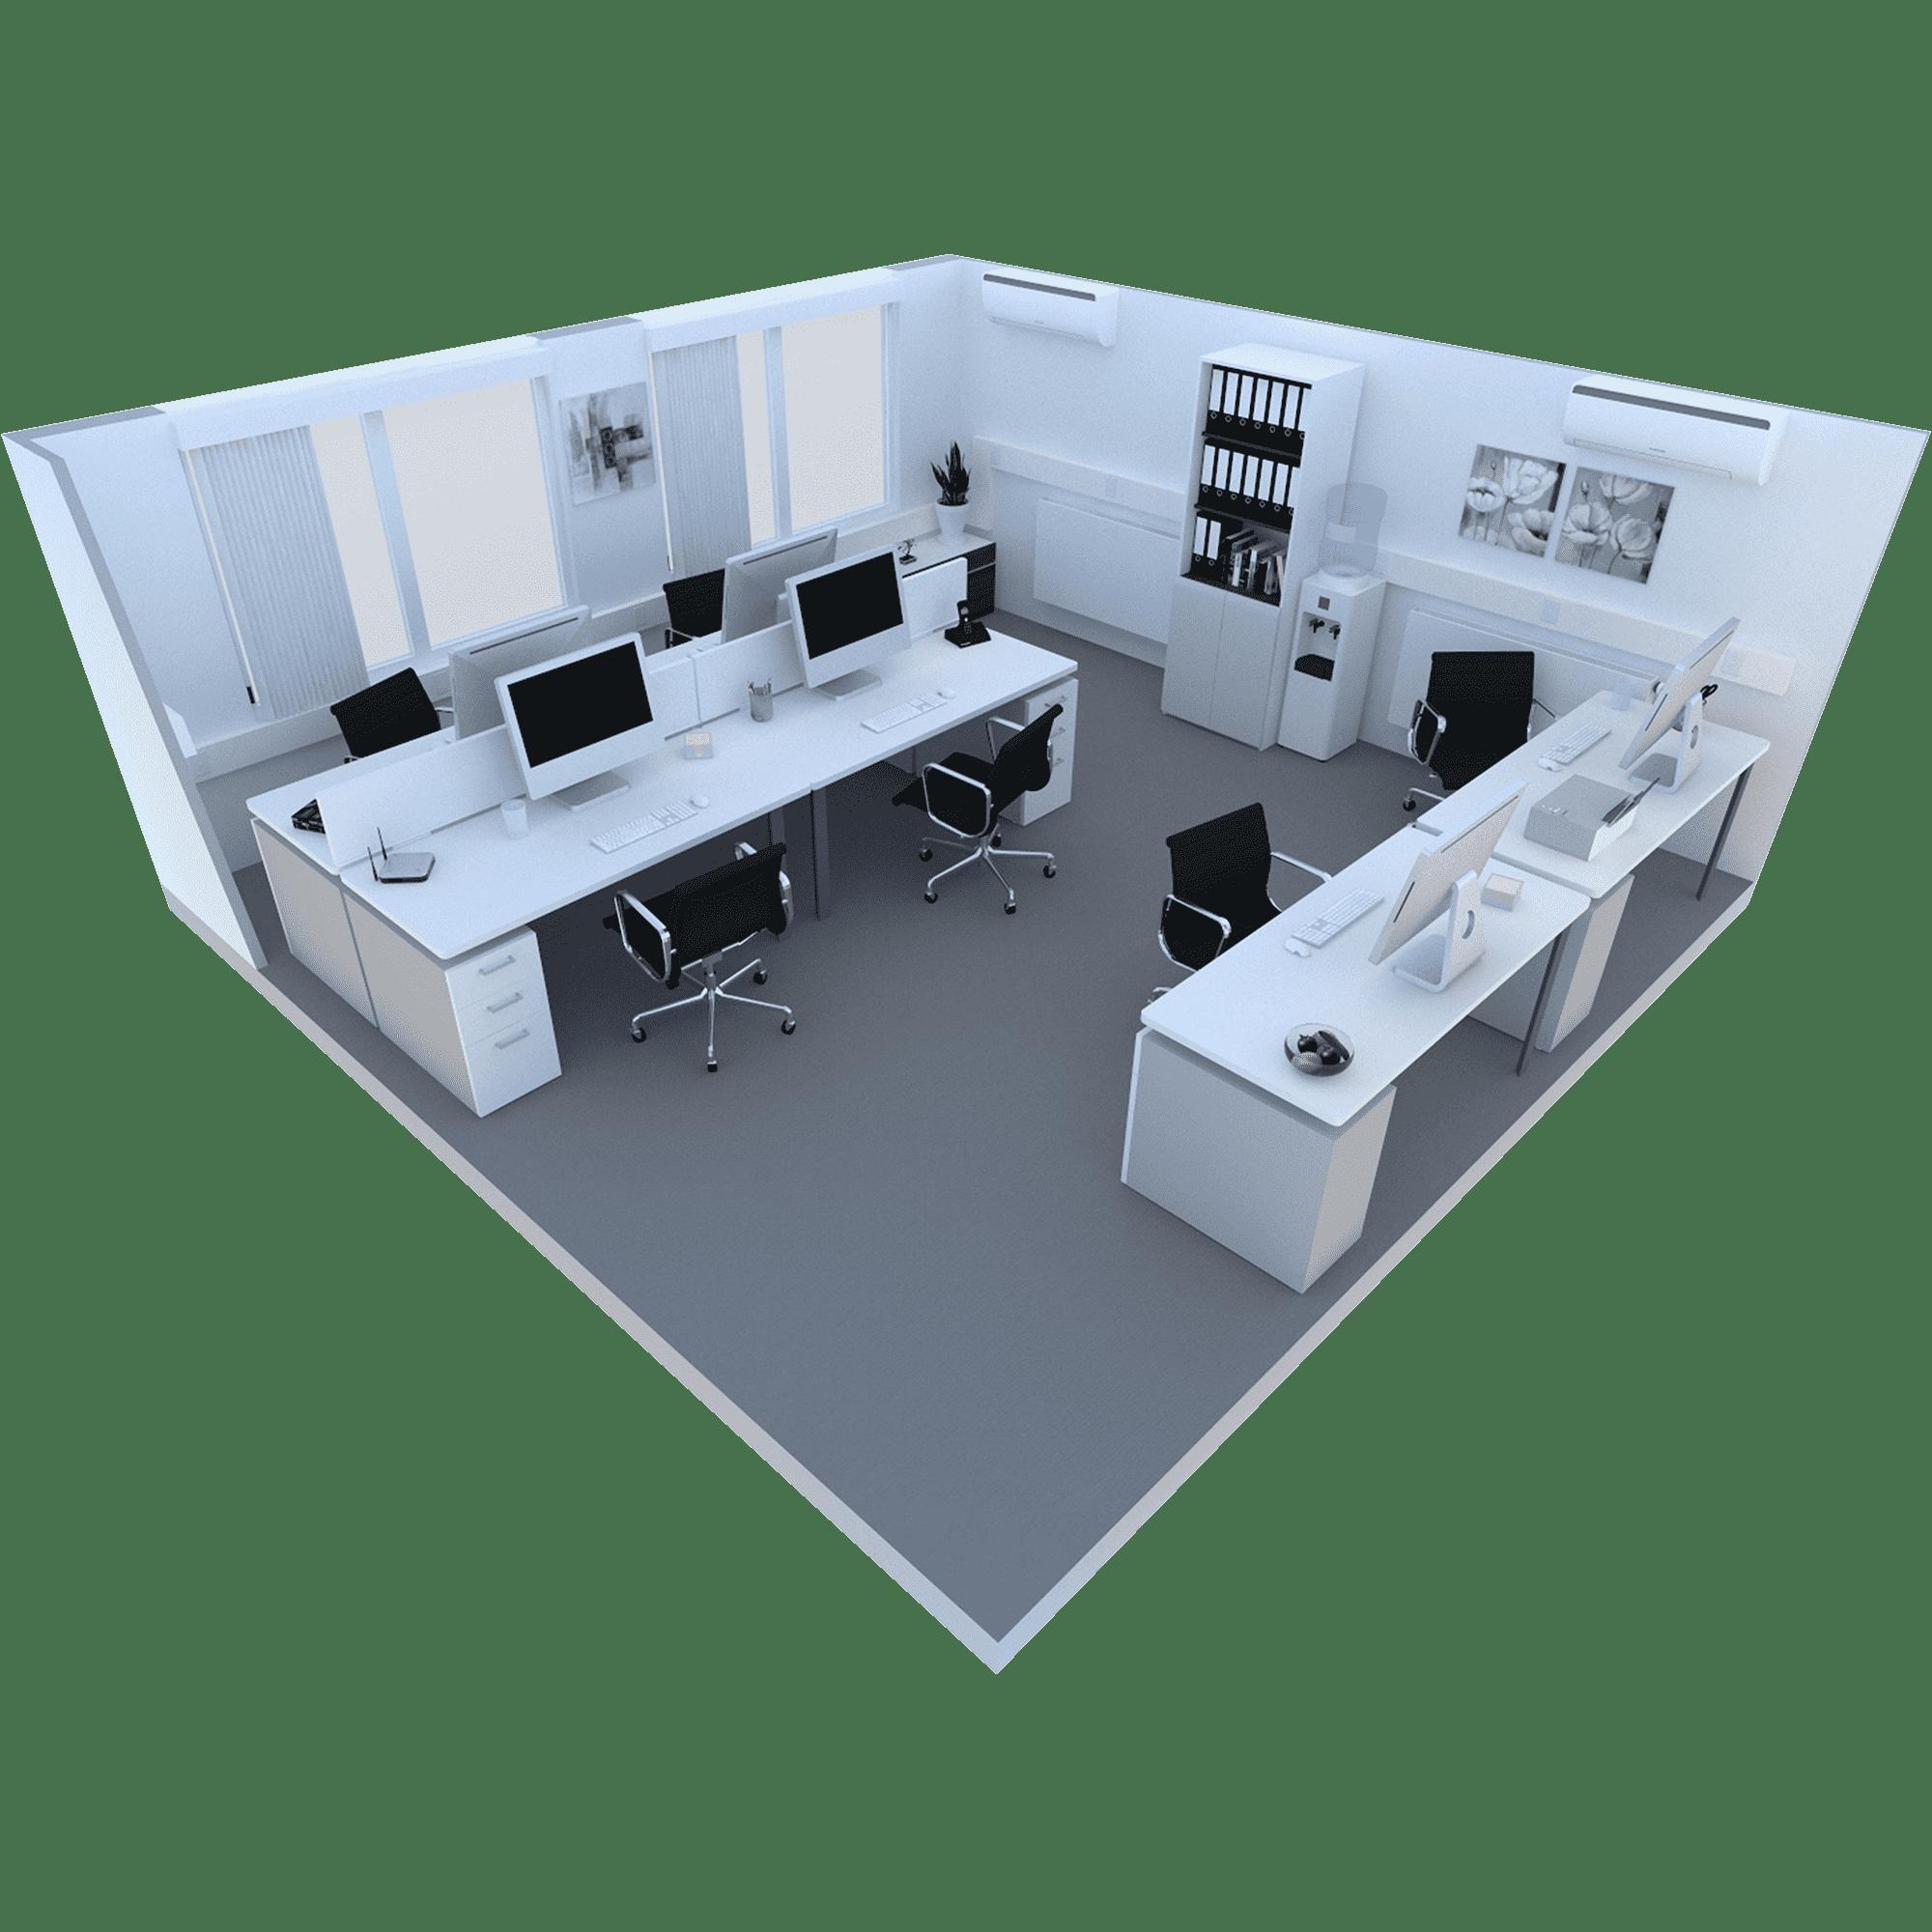 300 Sq ft Room